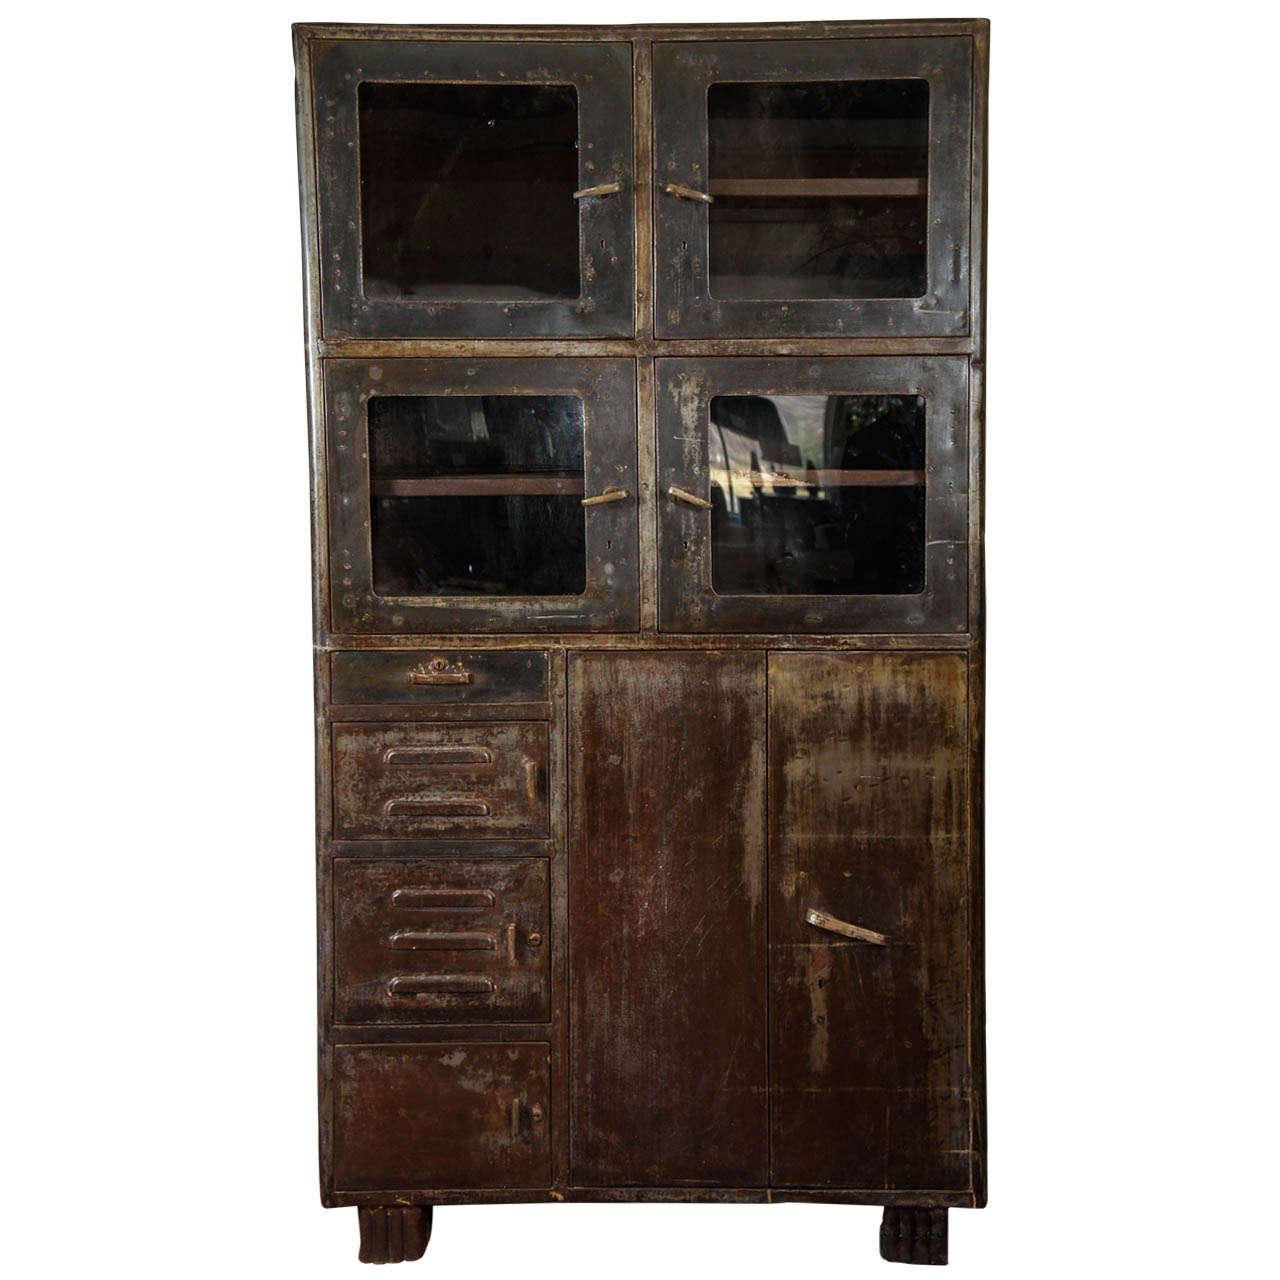 vintage industrial metal storage cabinet at 1stdibs Metal Storage Cabinets with Doors metal garage storage cabinet for sale